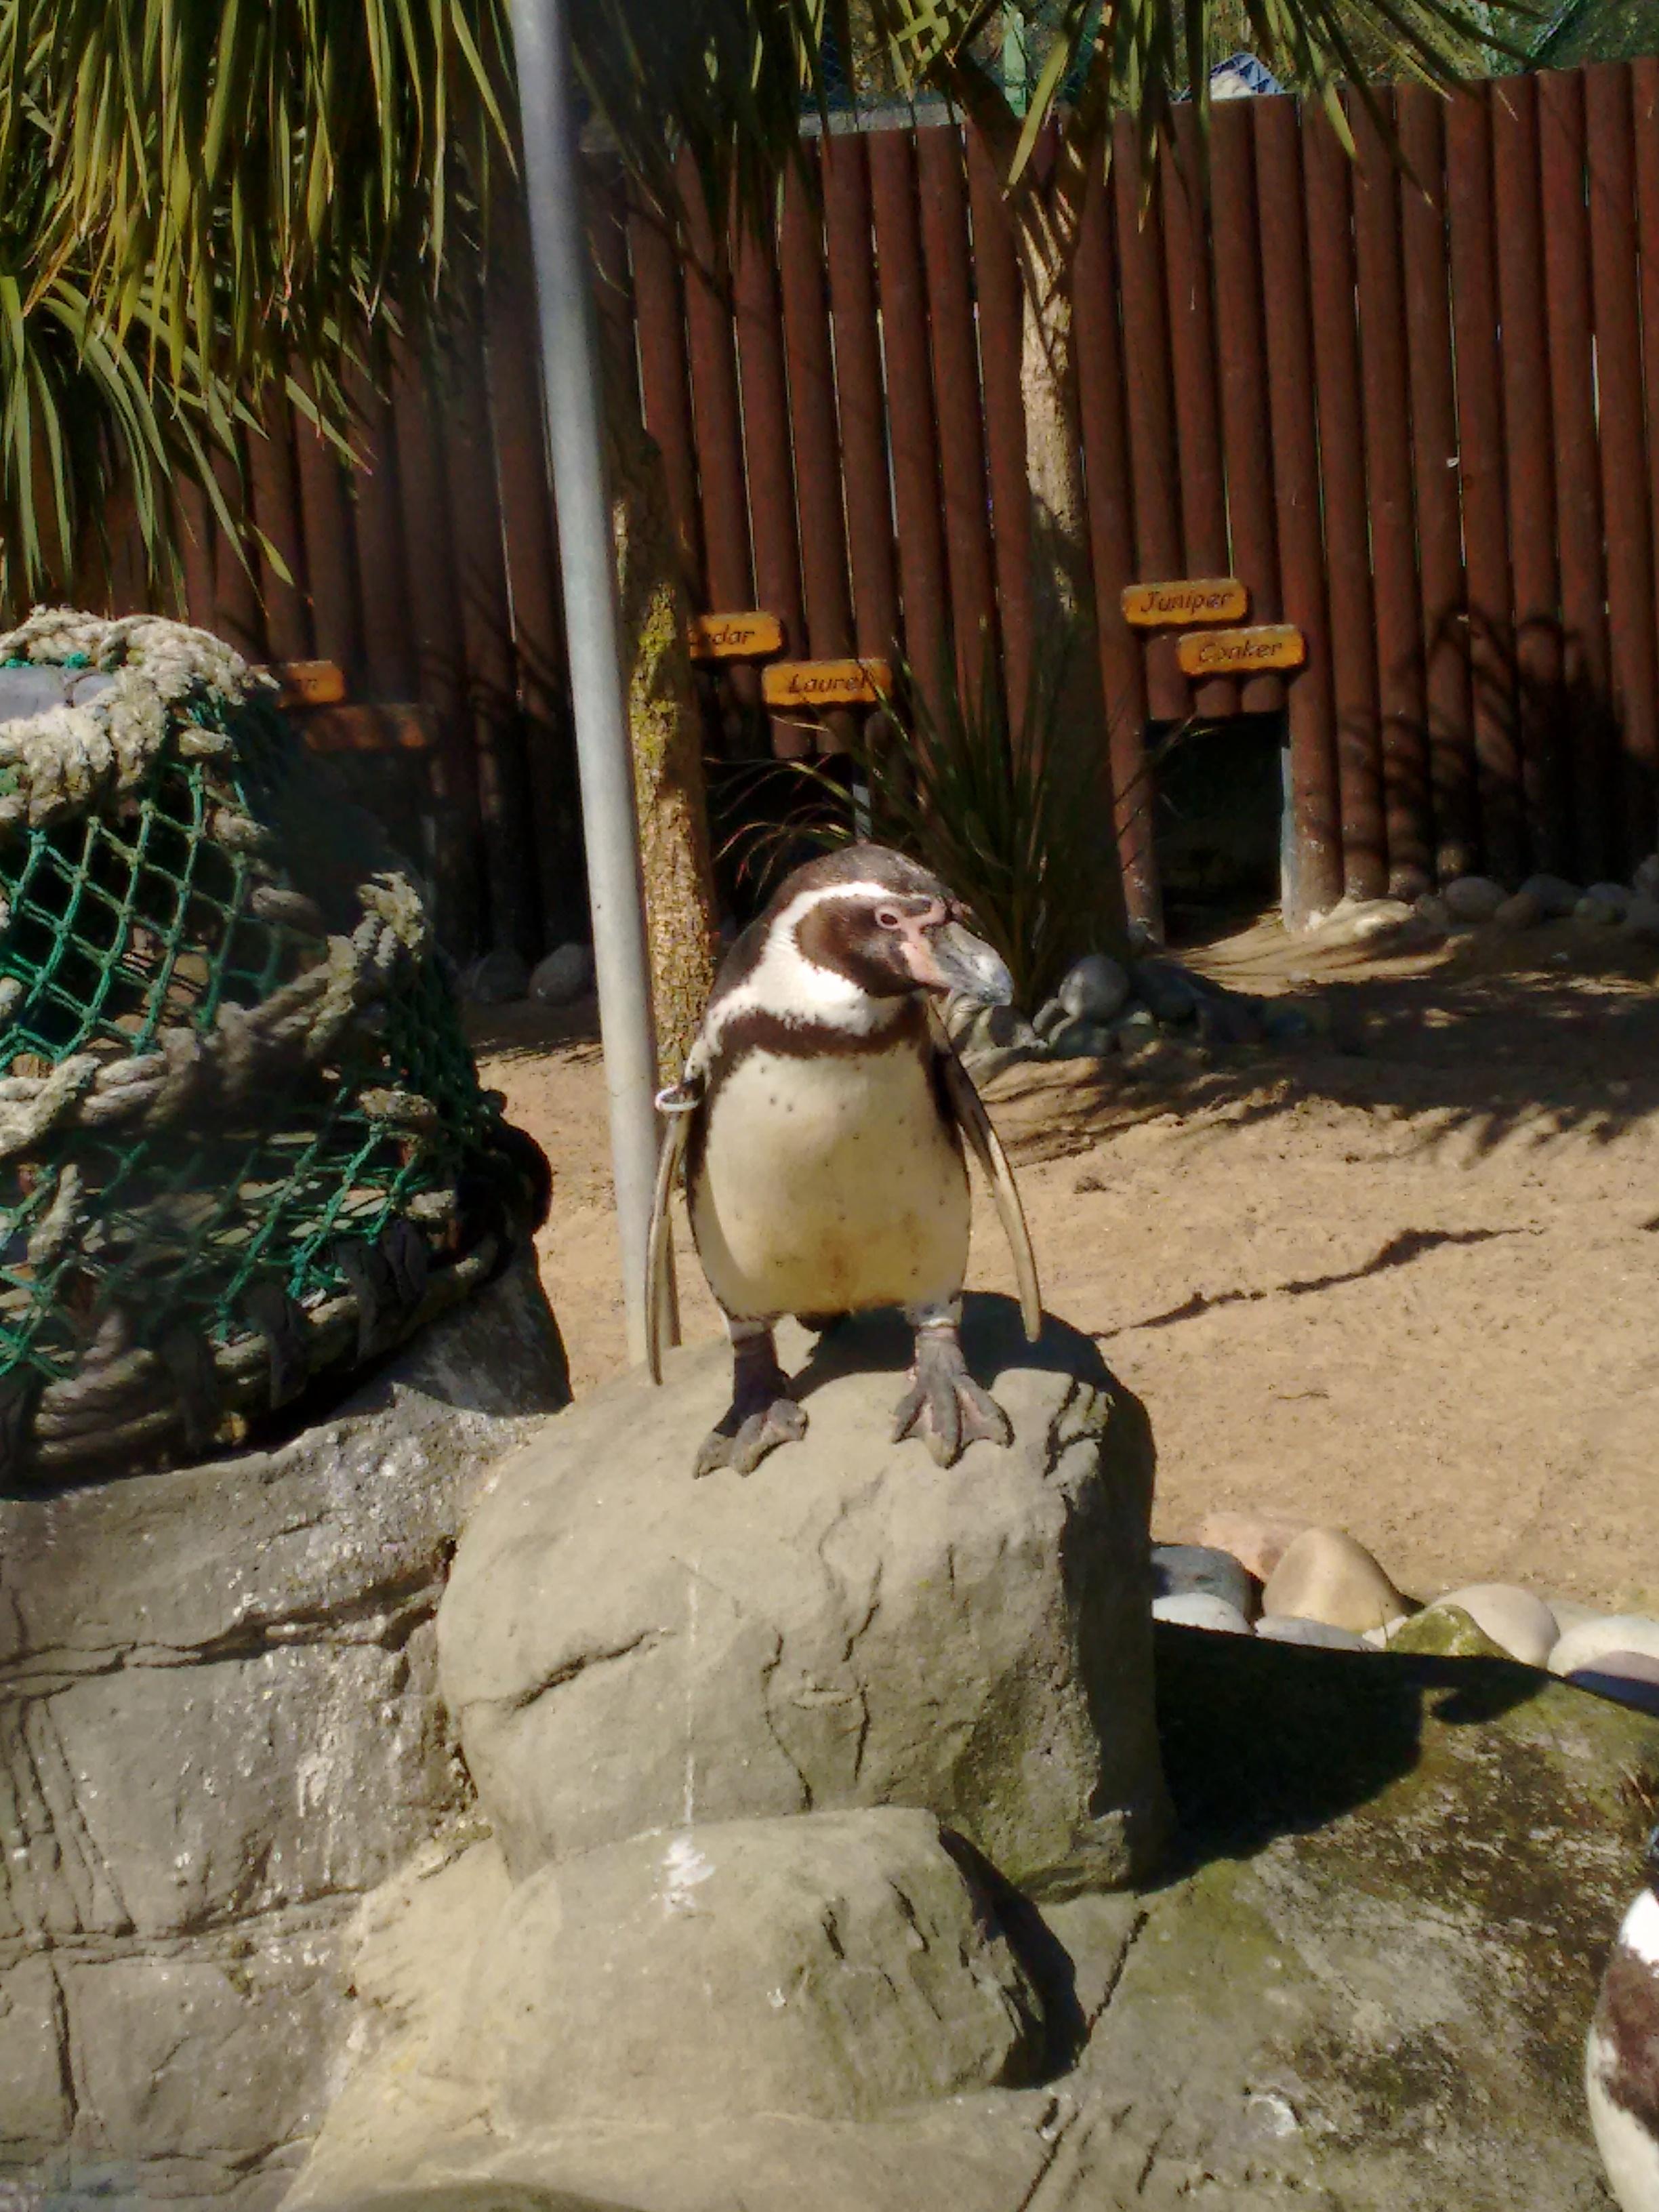 Sea Life Adventure Park - Penguin - Weymouth